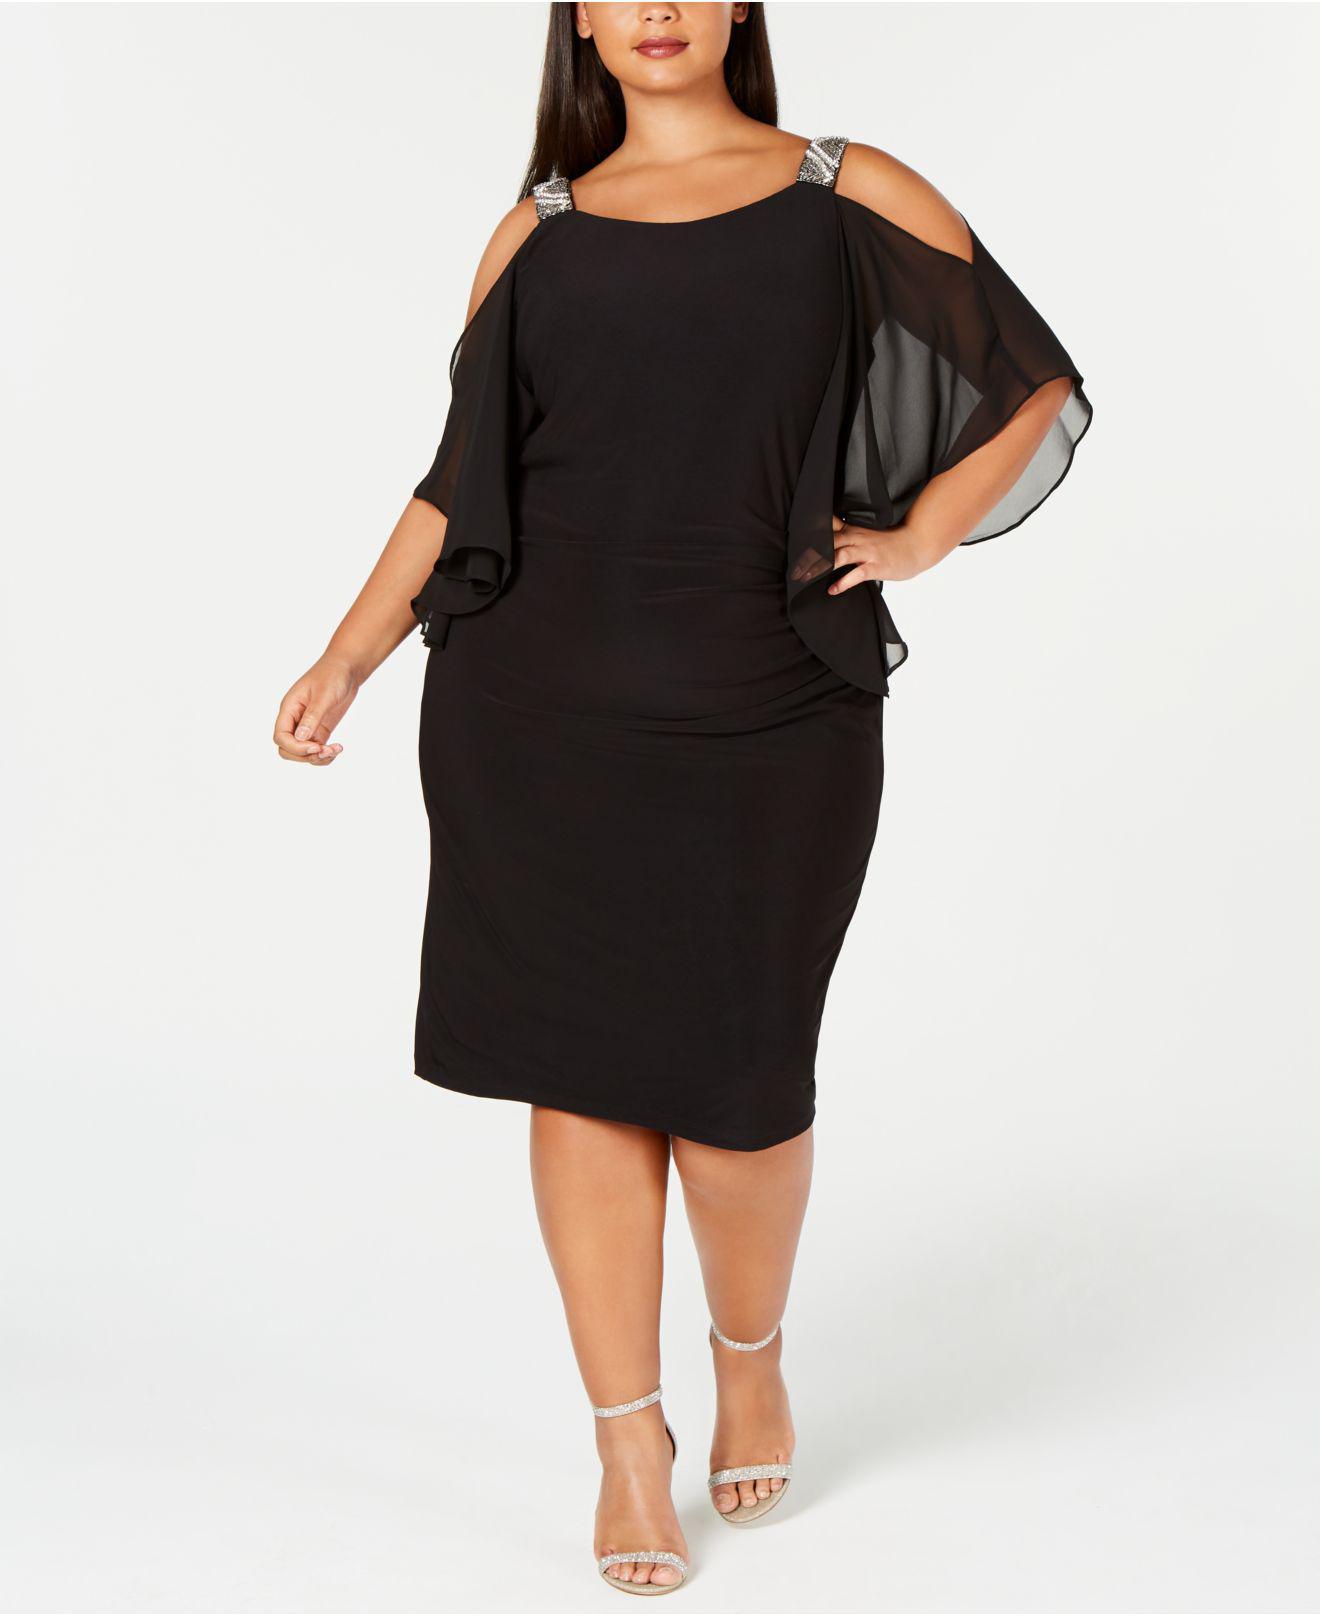 e985c266a69 Xscape - Black Plus Size Rhinestone Cold-shoulder Sheath Dress - Lyst. View  fullscreen